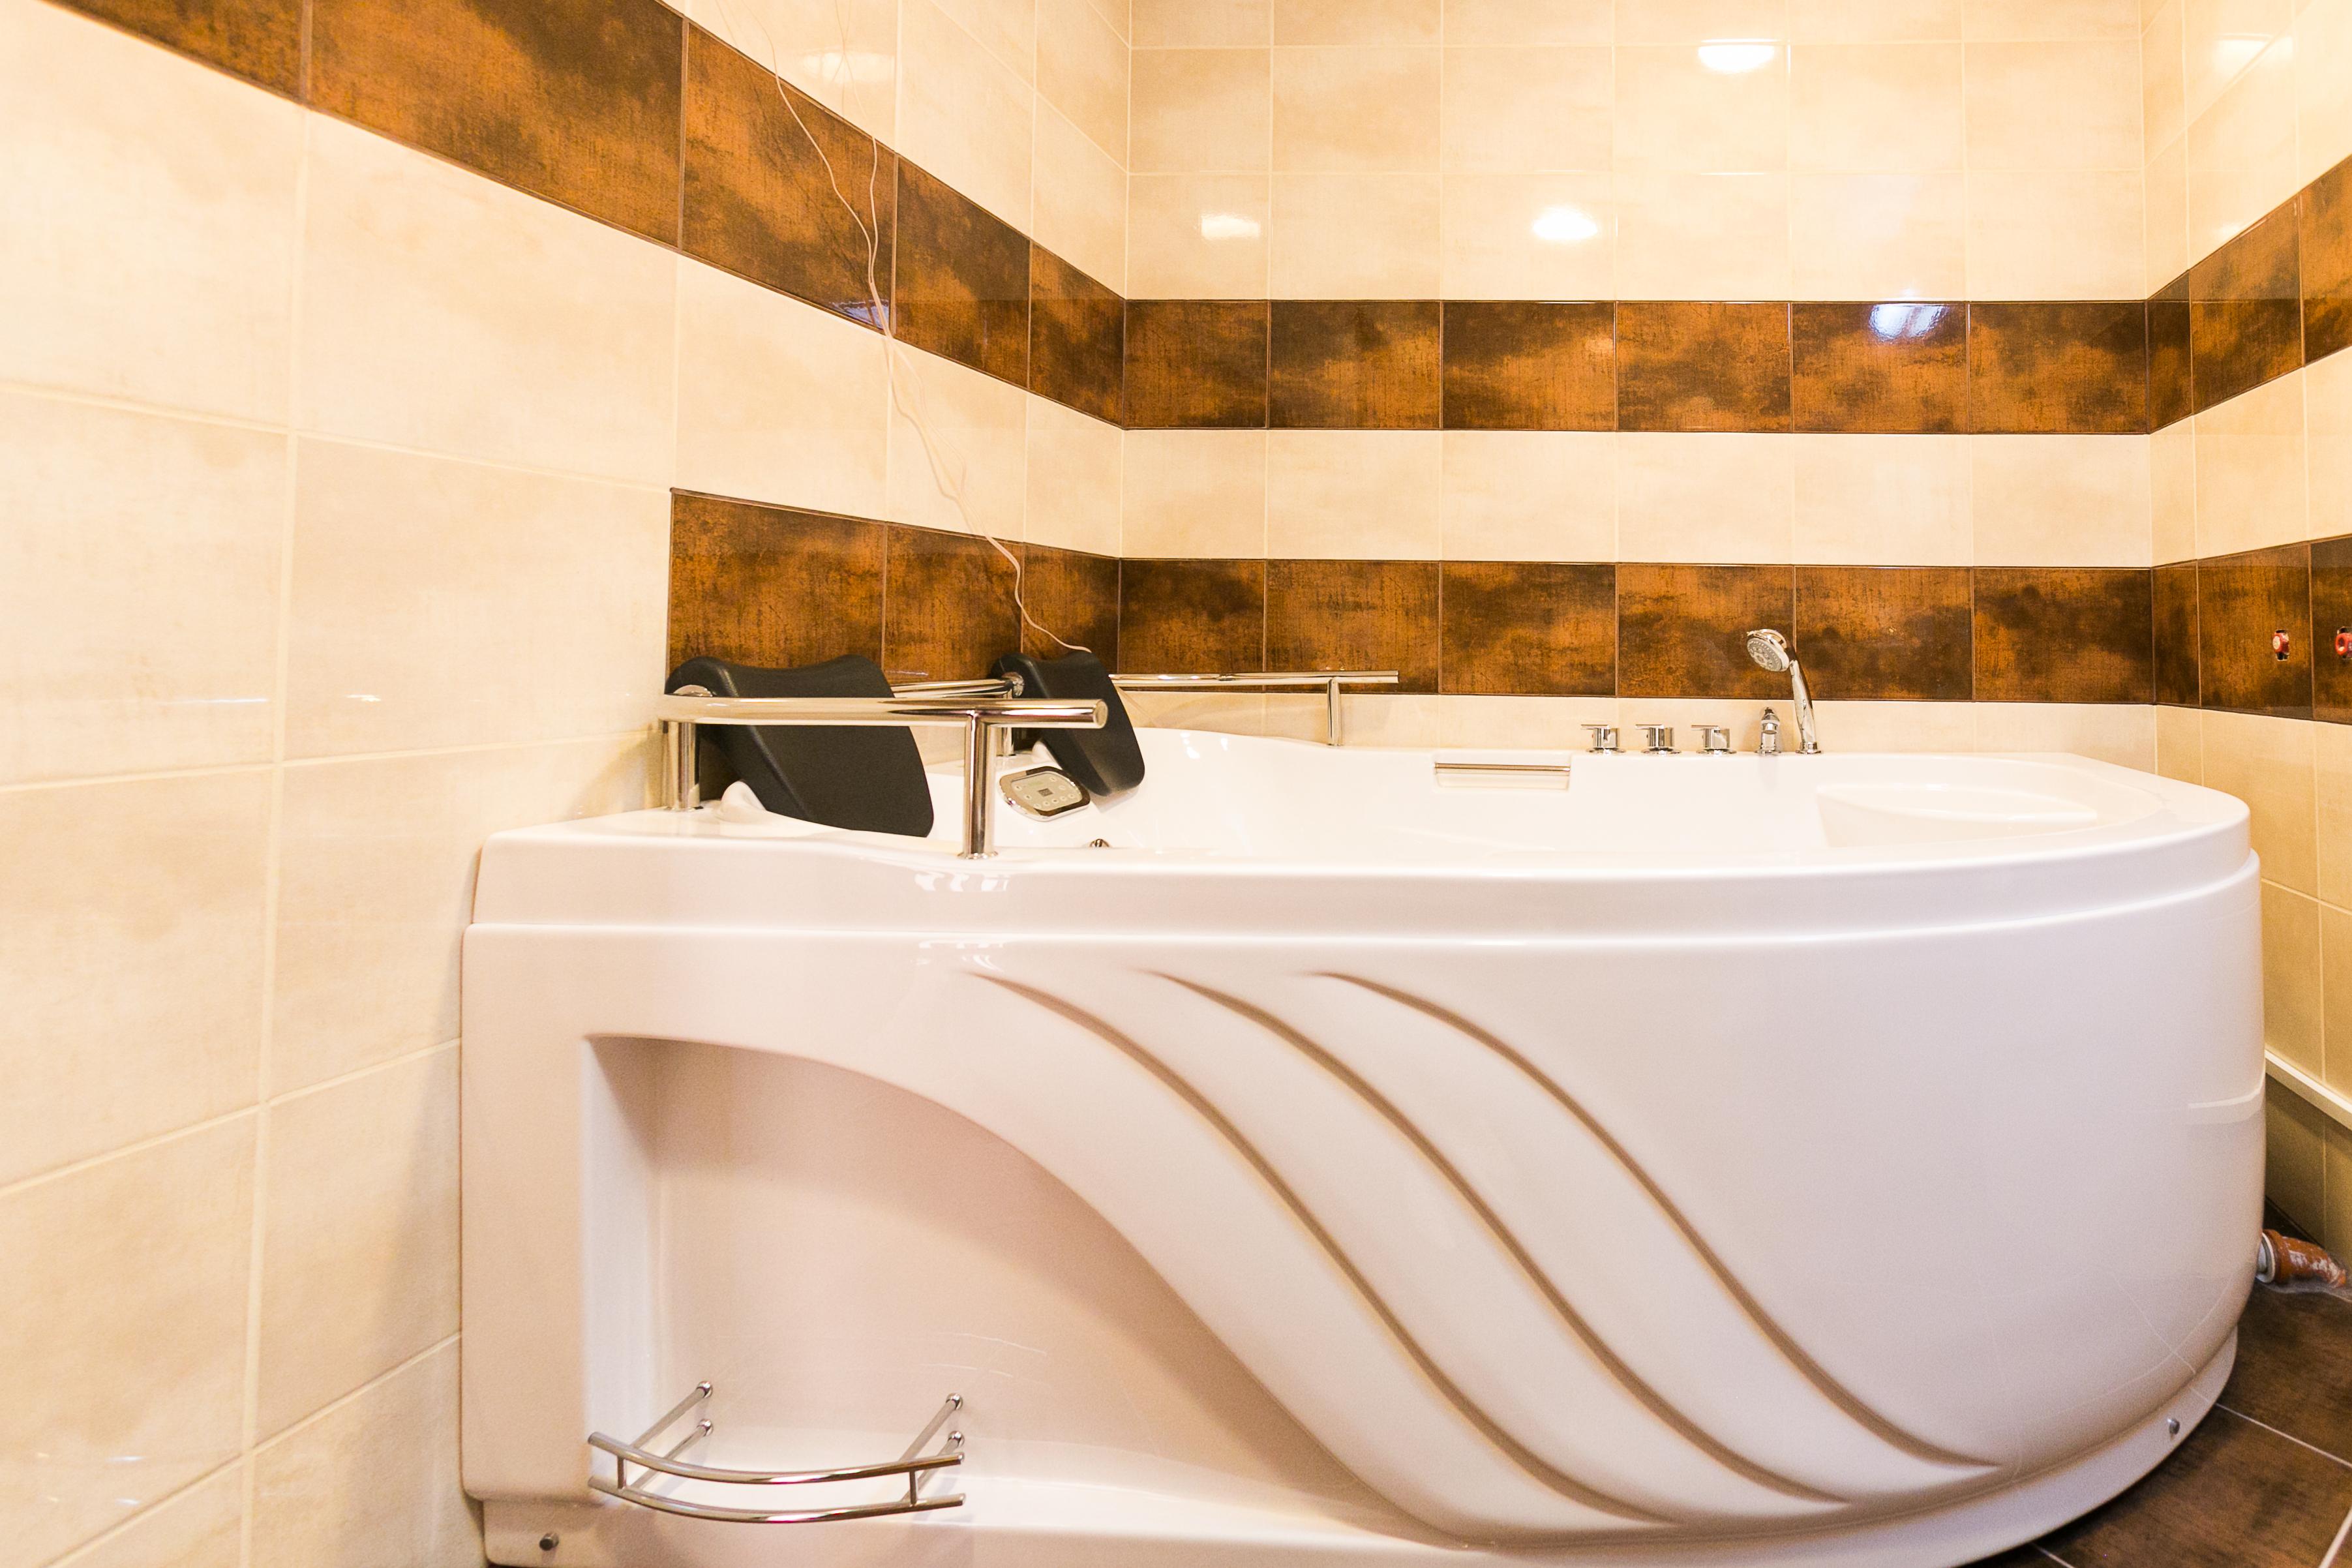 http://hotelparadise.bg/wp-content/uploads/2016/08/hot-tub.jpg